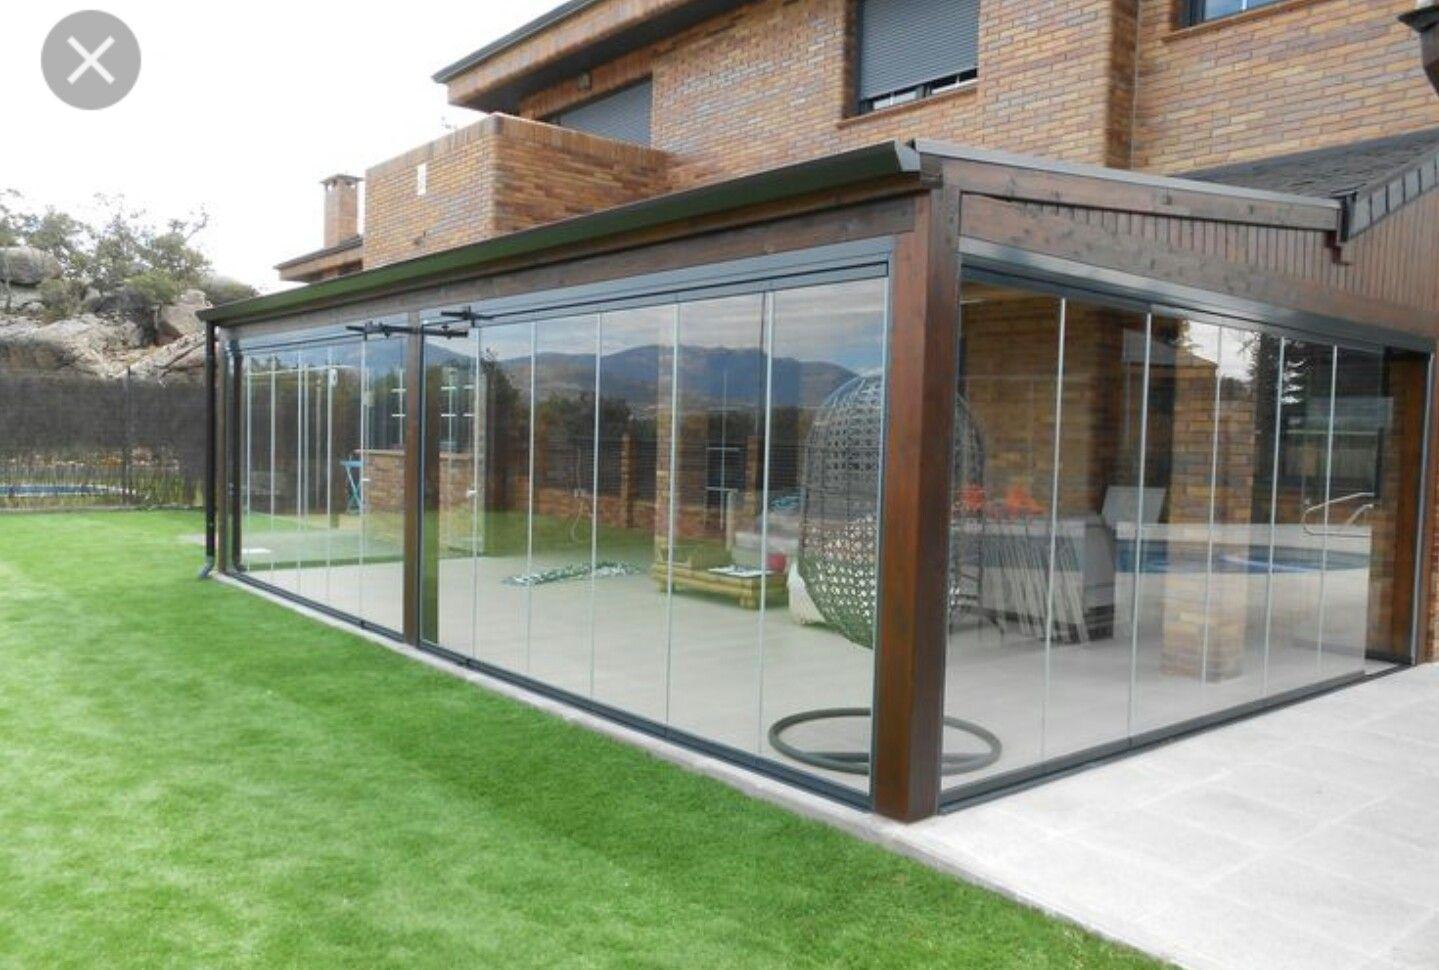 Cerramiento exterior porches arquitetura pinterest for Planos terrazas exteriores